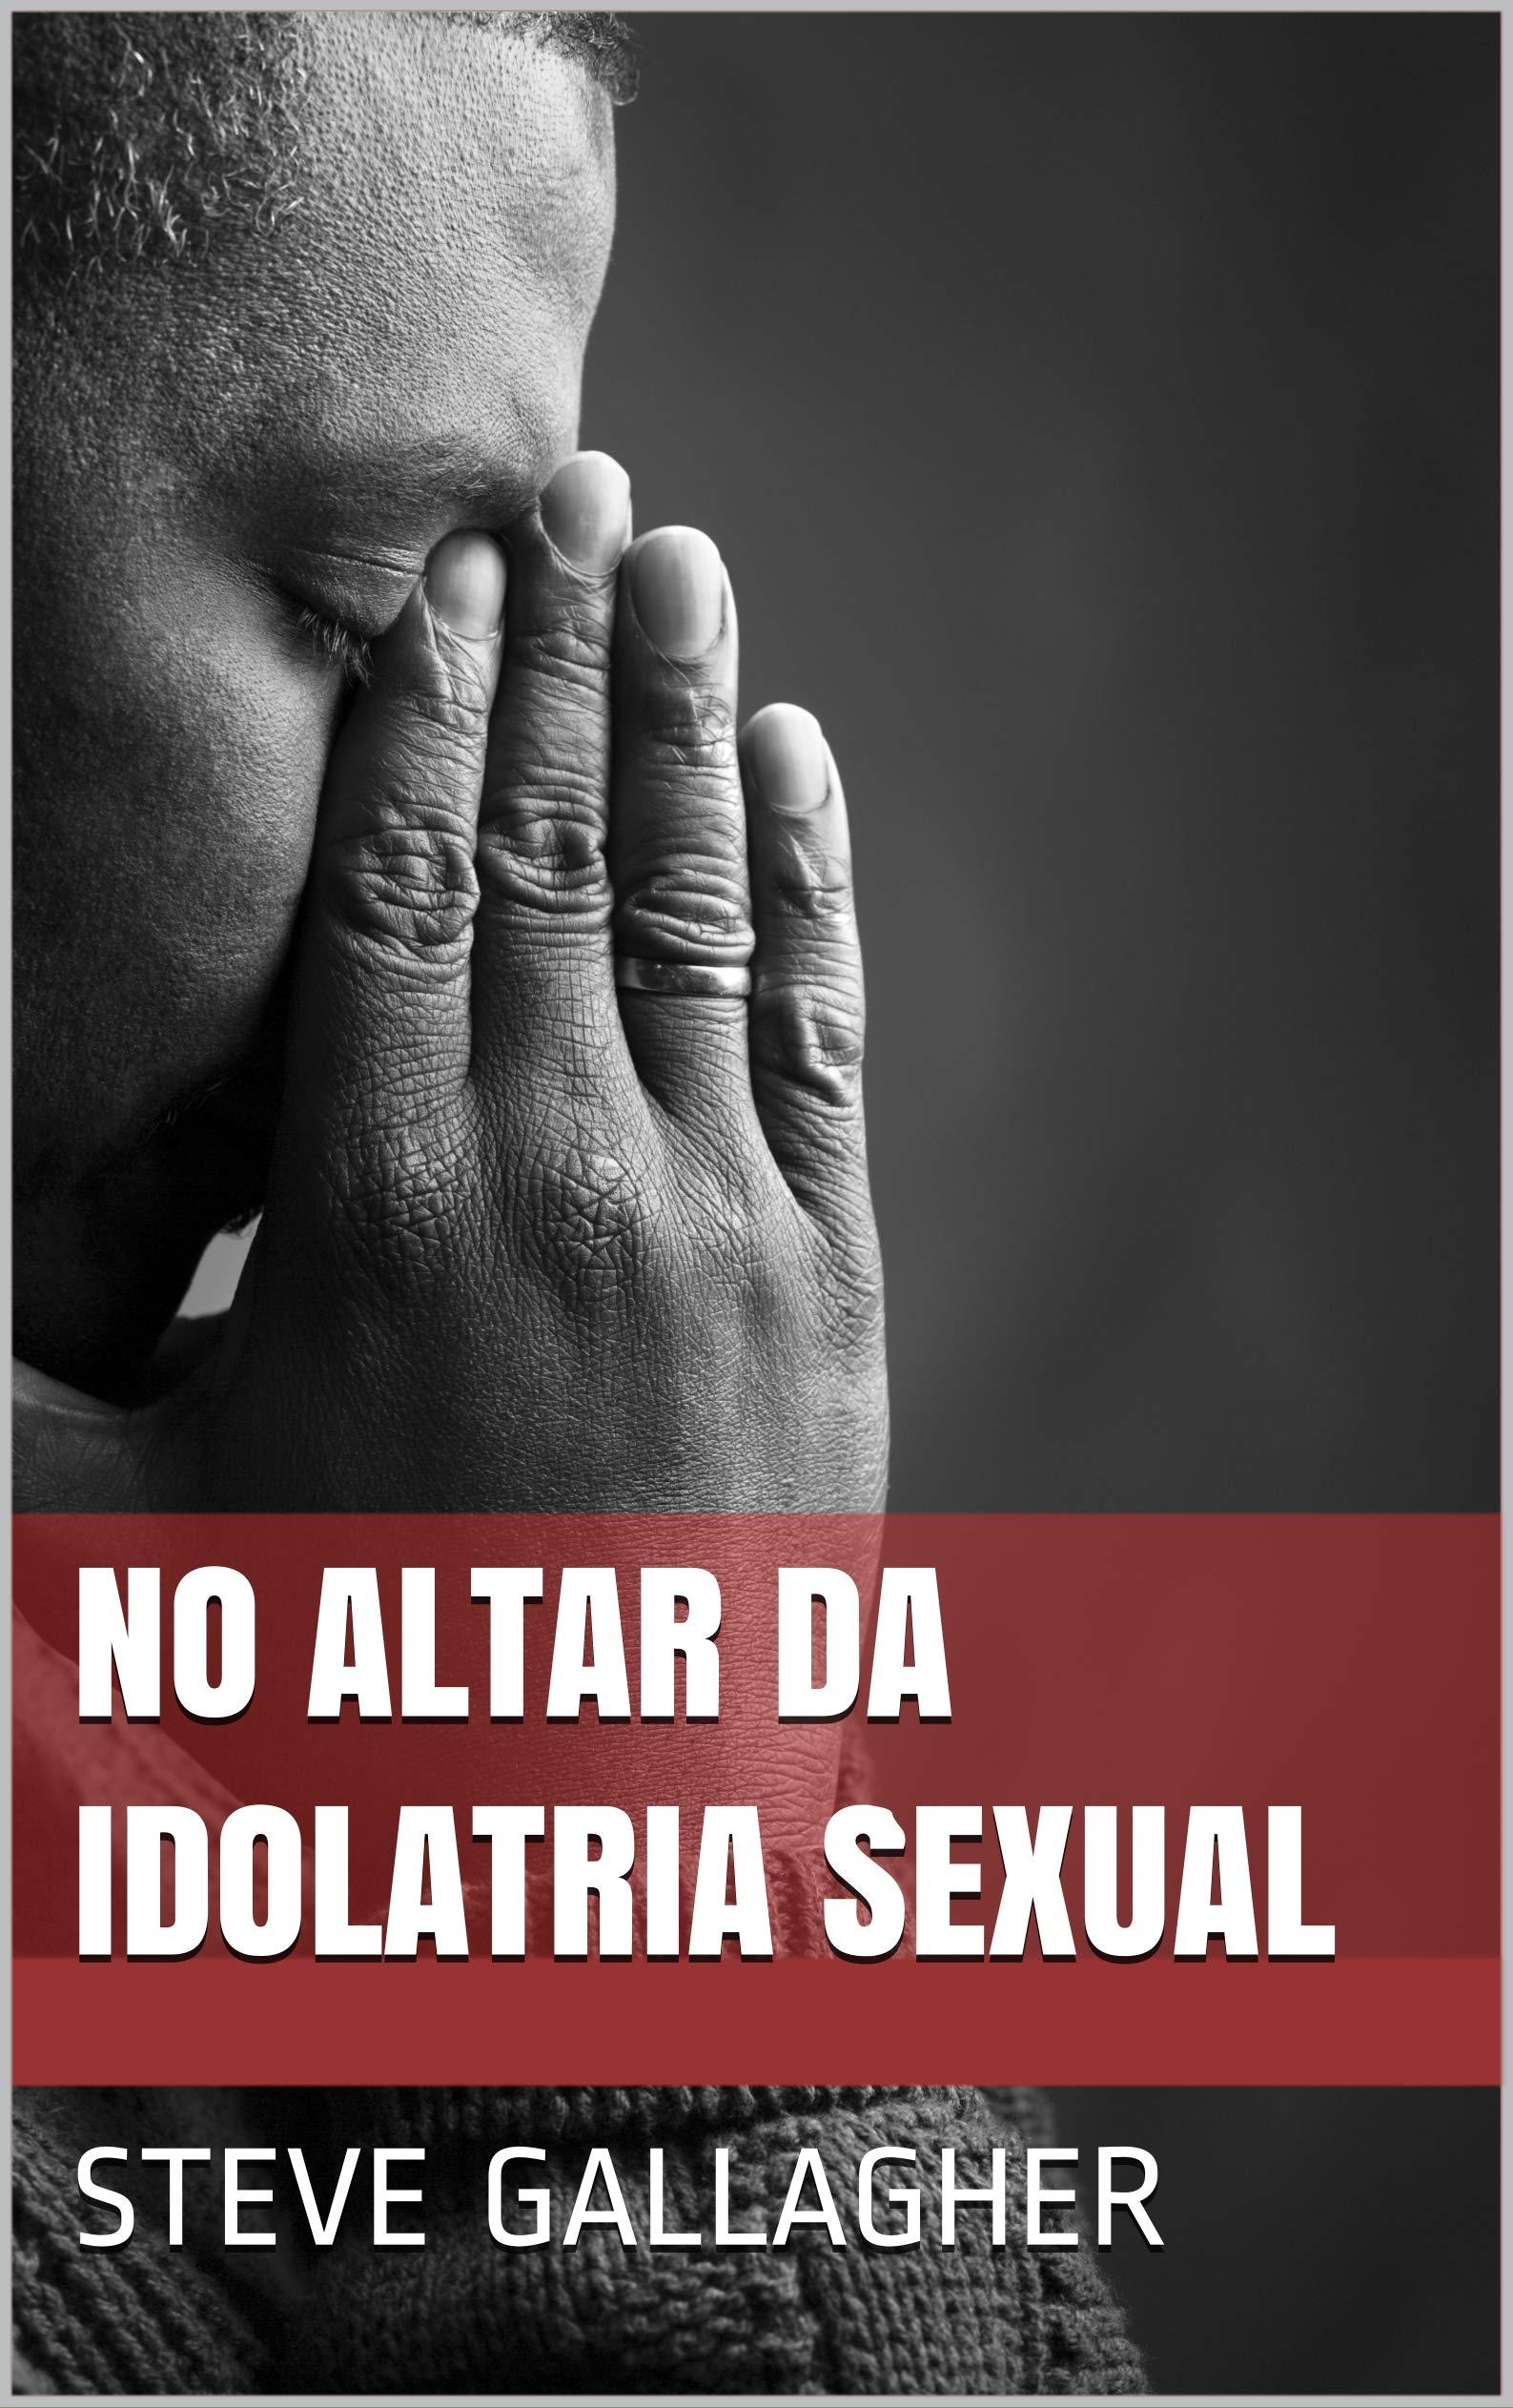 No Altar da Idolatria Sexual Steve Gallagher, Bruno Valente